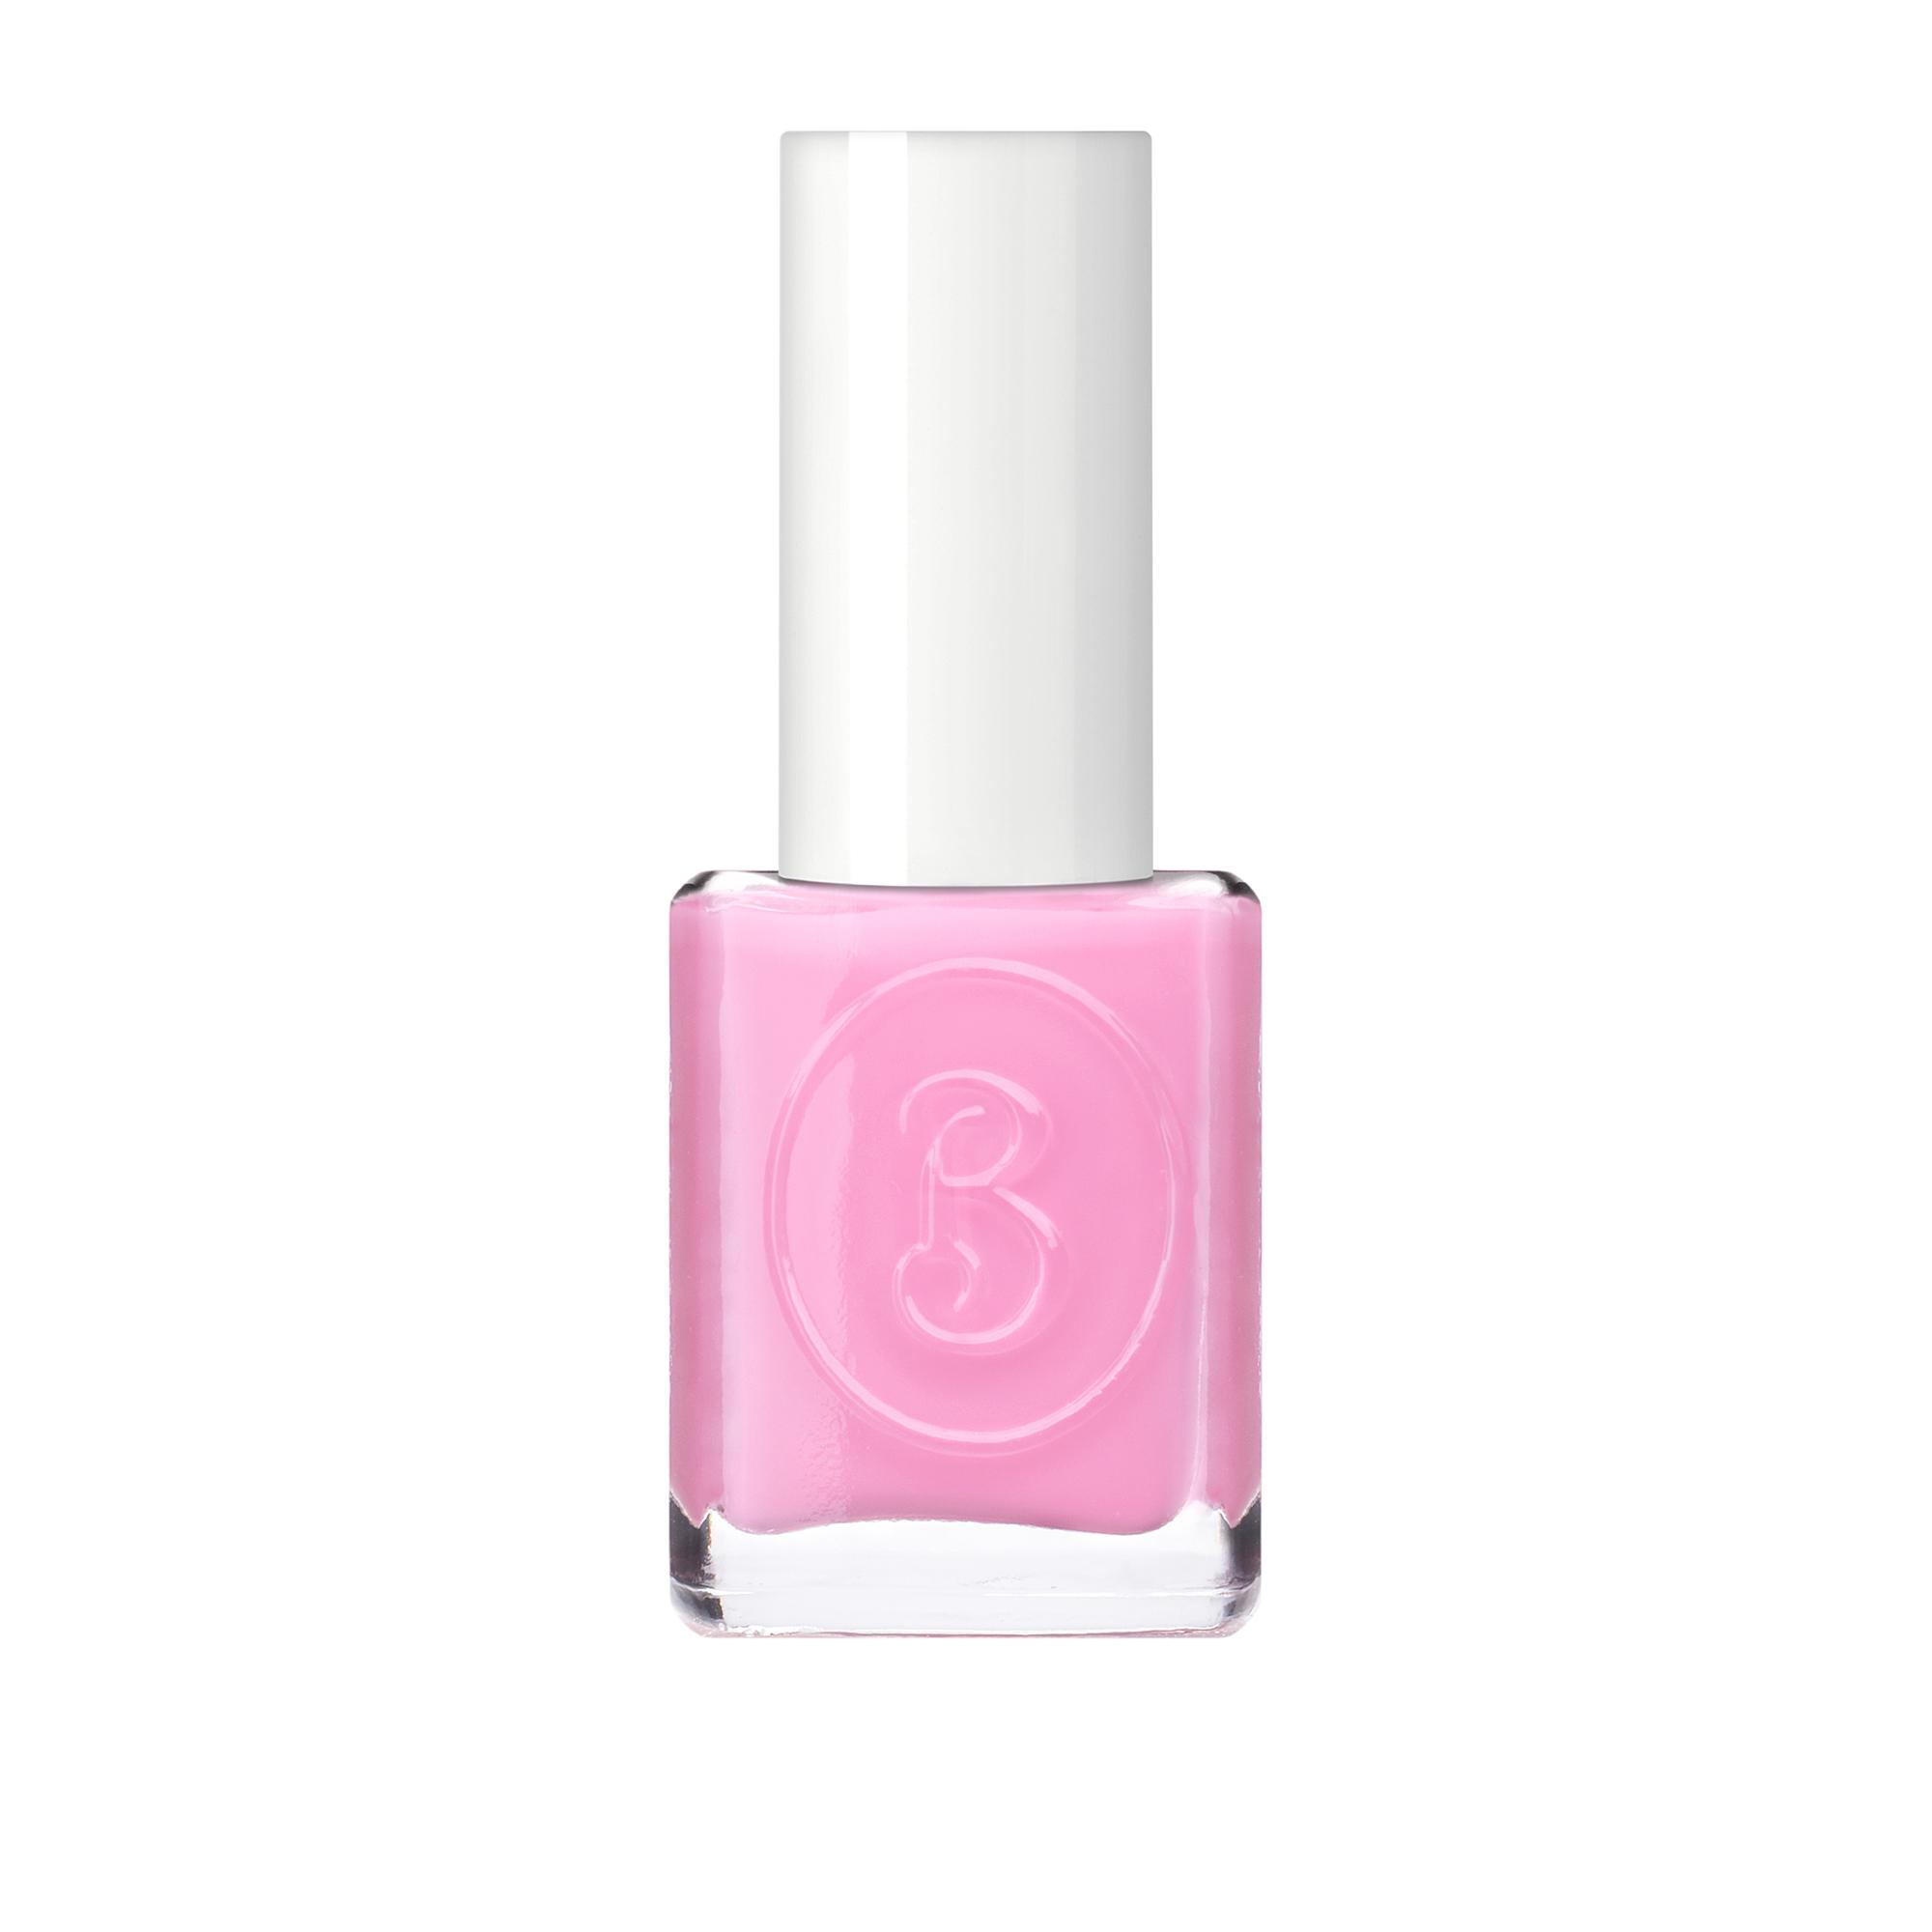 BERENICE 50 лак для ногтей, розовый пломбир / Baby pink 16 мл лаки для ногтей berenice лак для ногтей 18 тон 16 мл